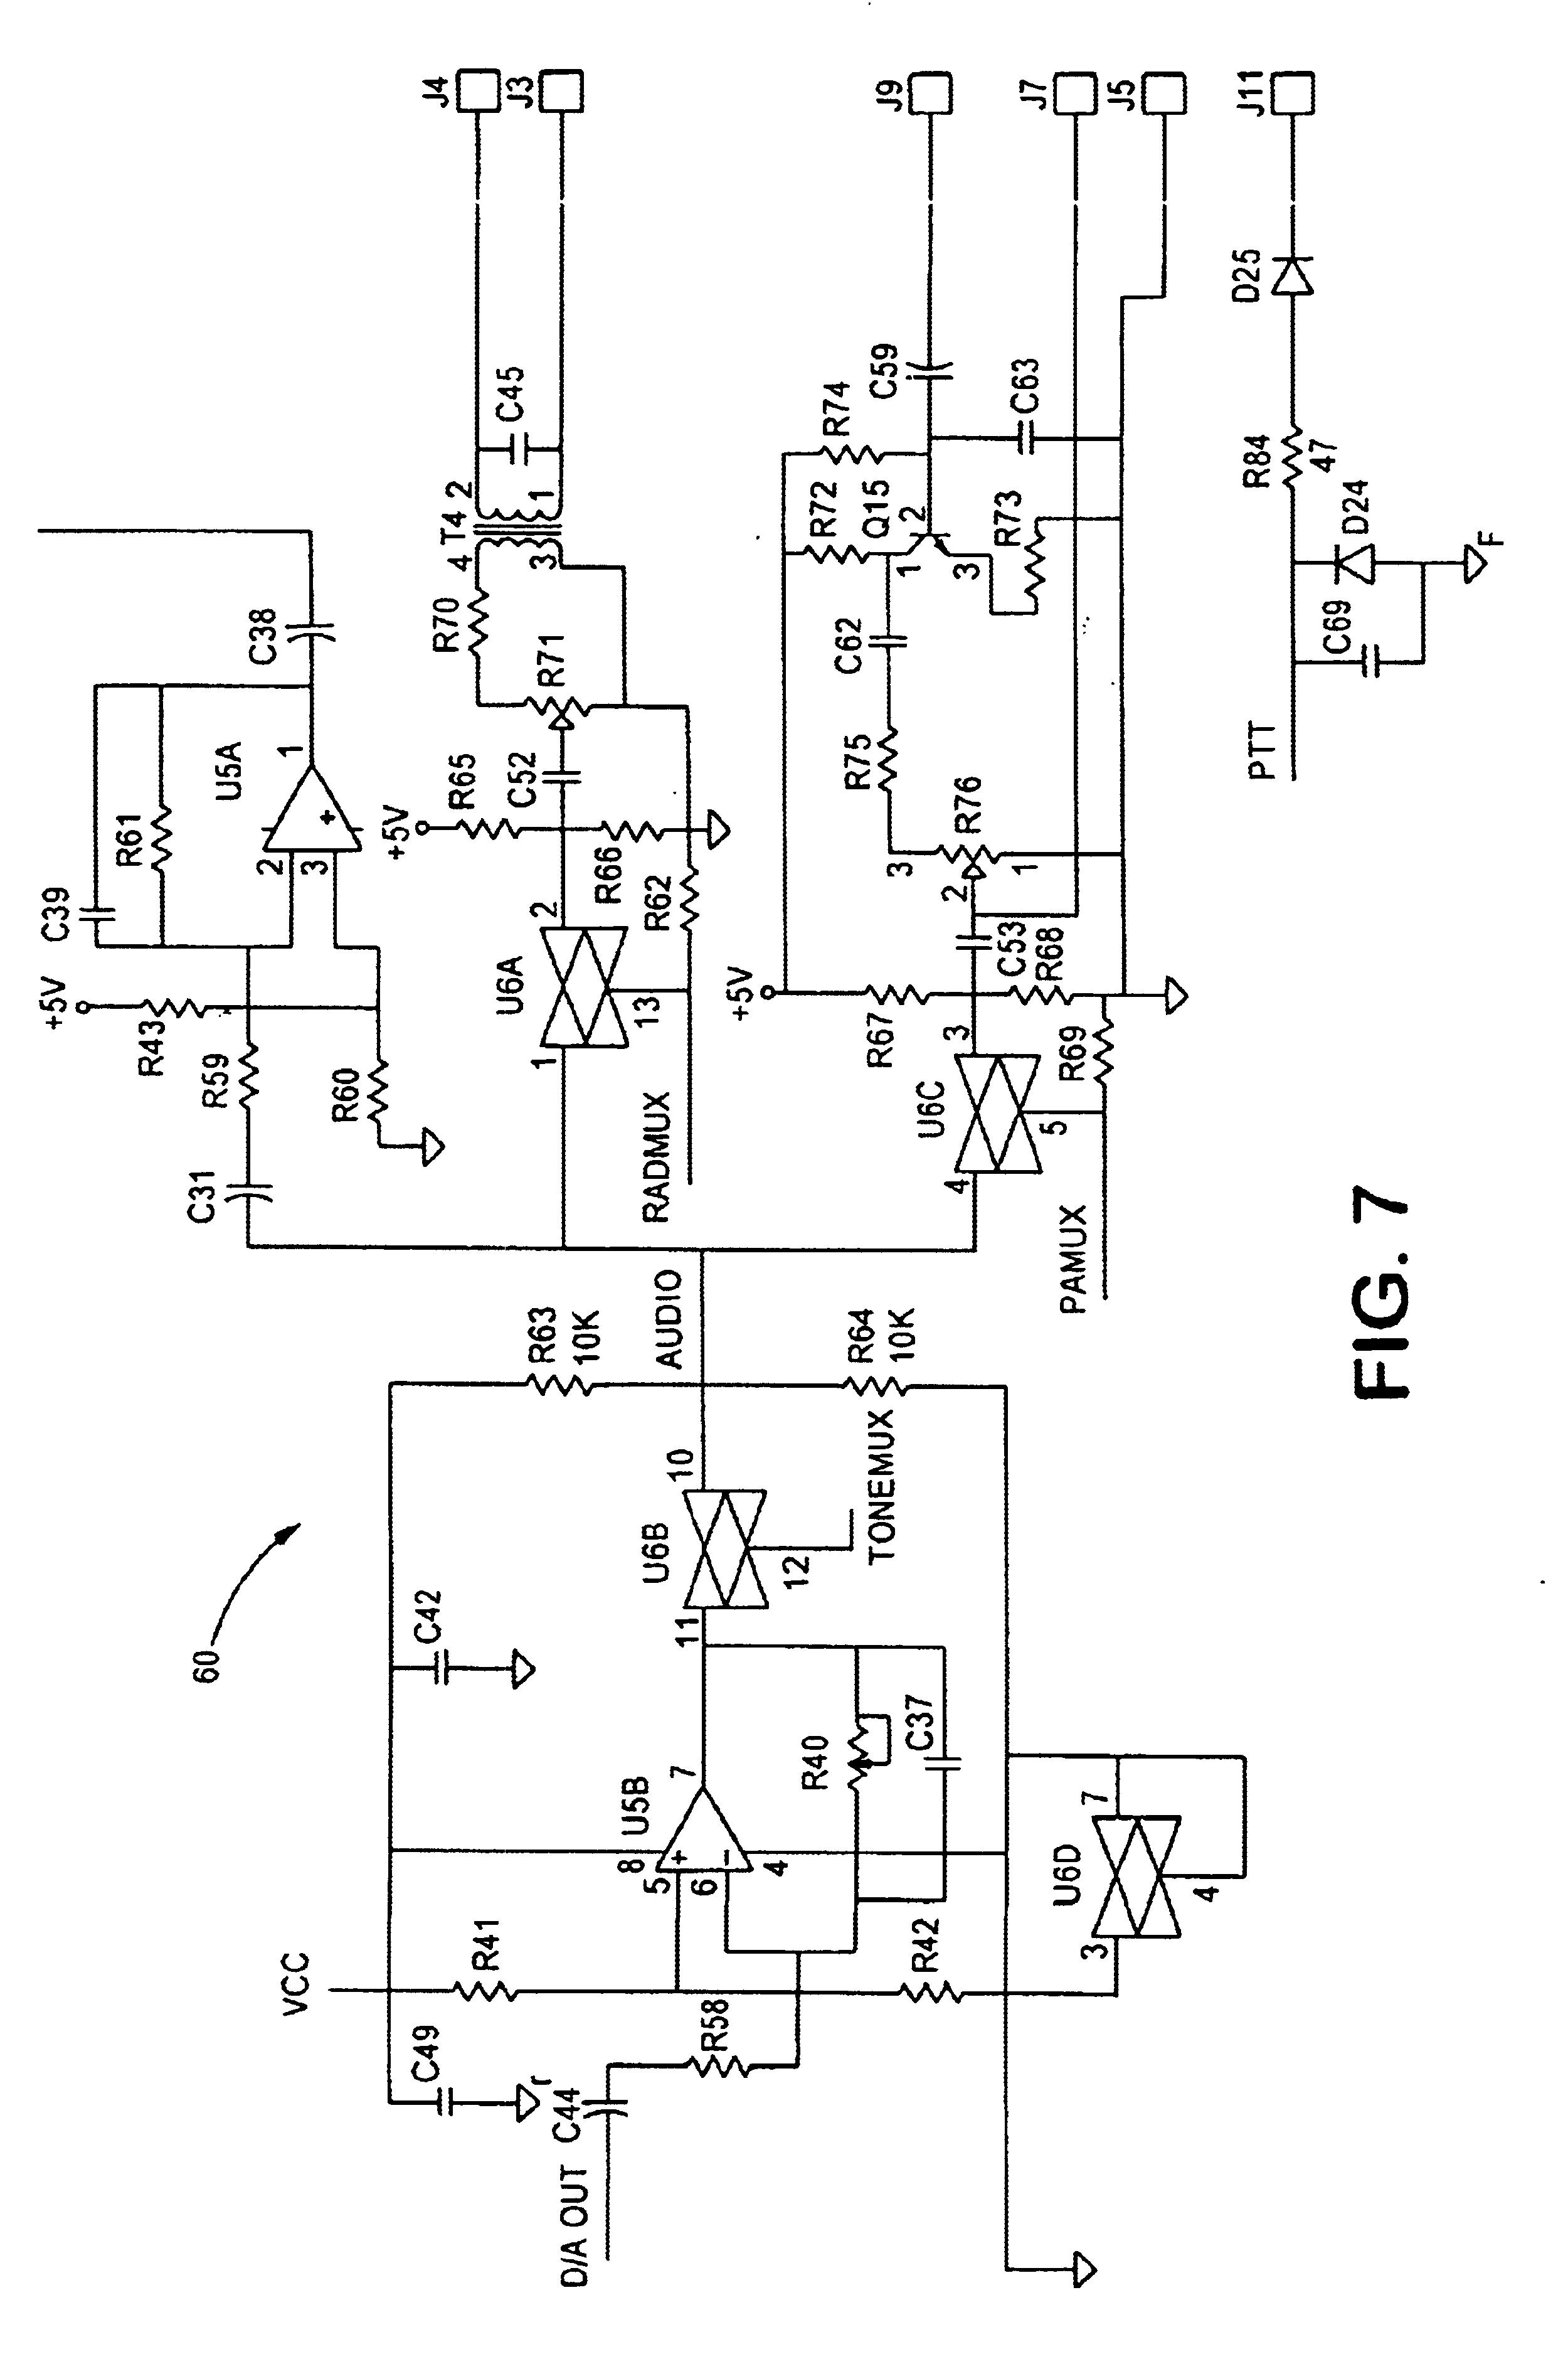 Code 3 Ledx Wiring Diagram